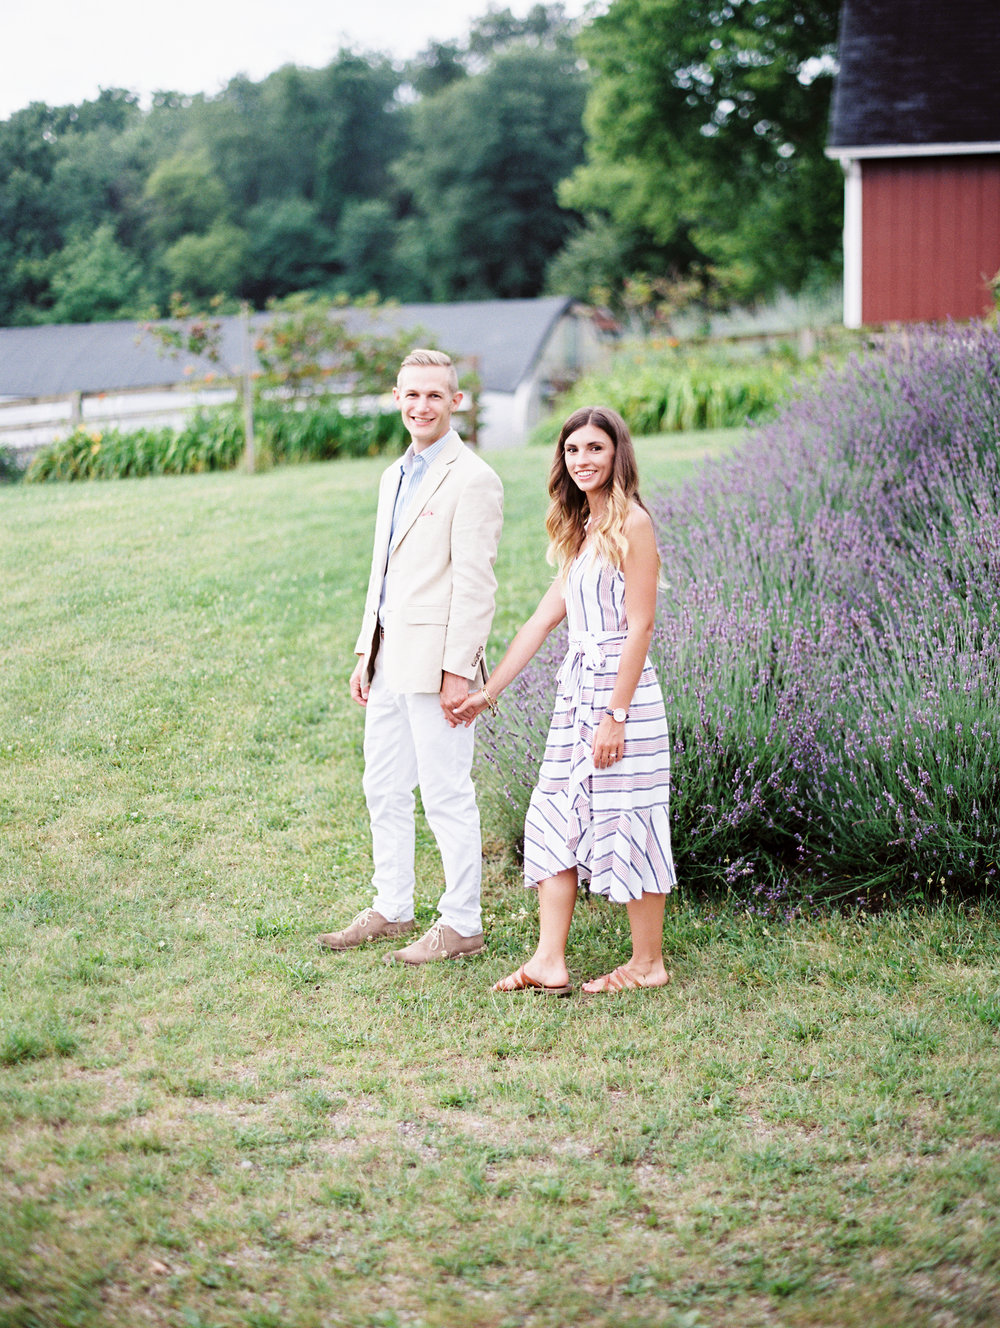 Kerri+Austin+Lavender+Field+Engagement-105.jpg